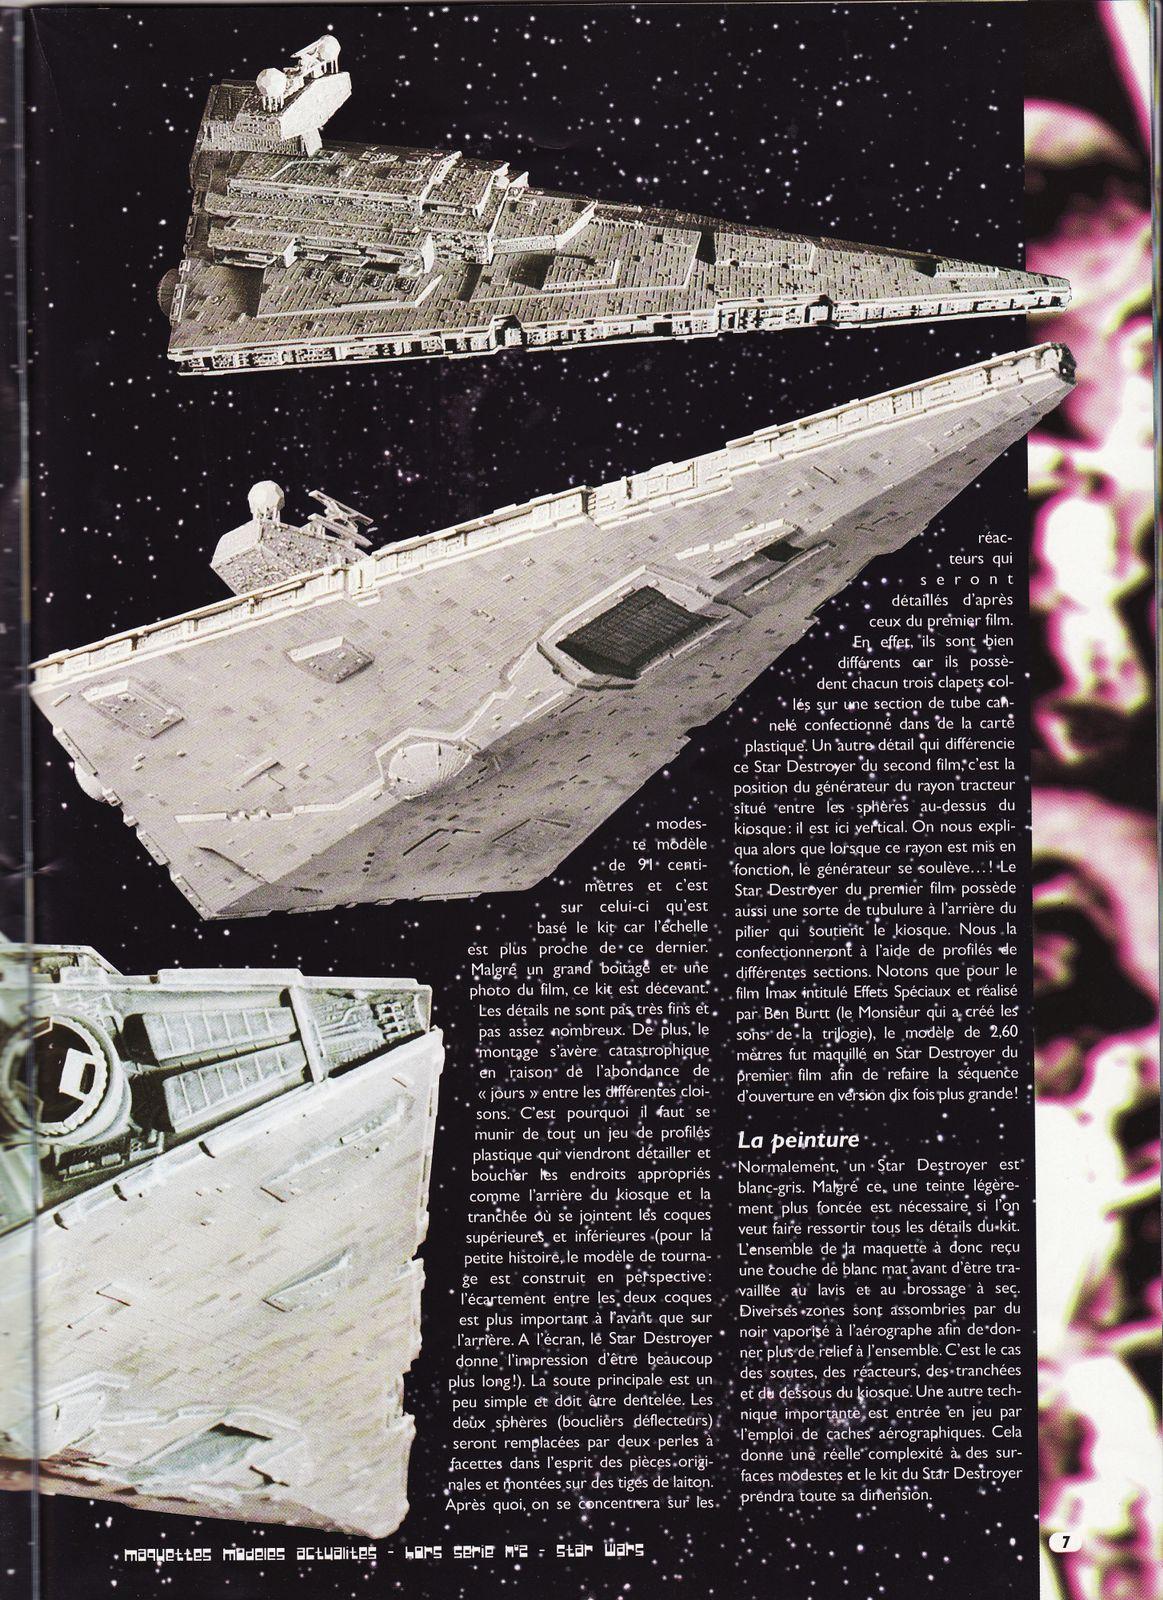 13 imperial star destroyer 2